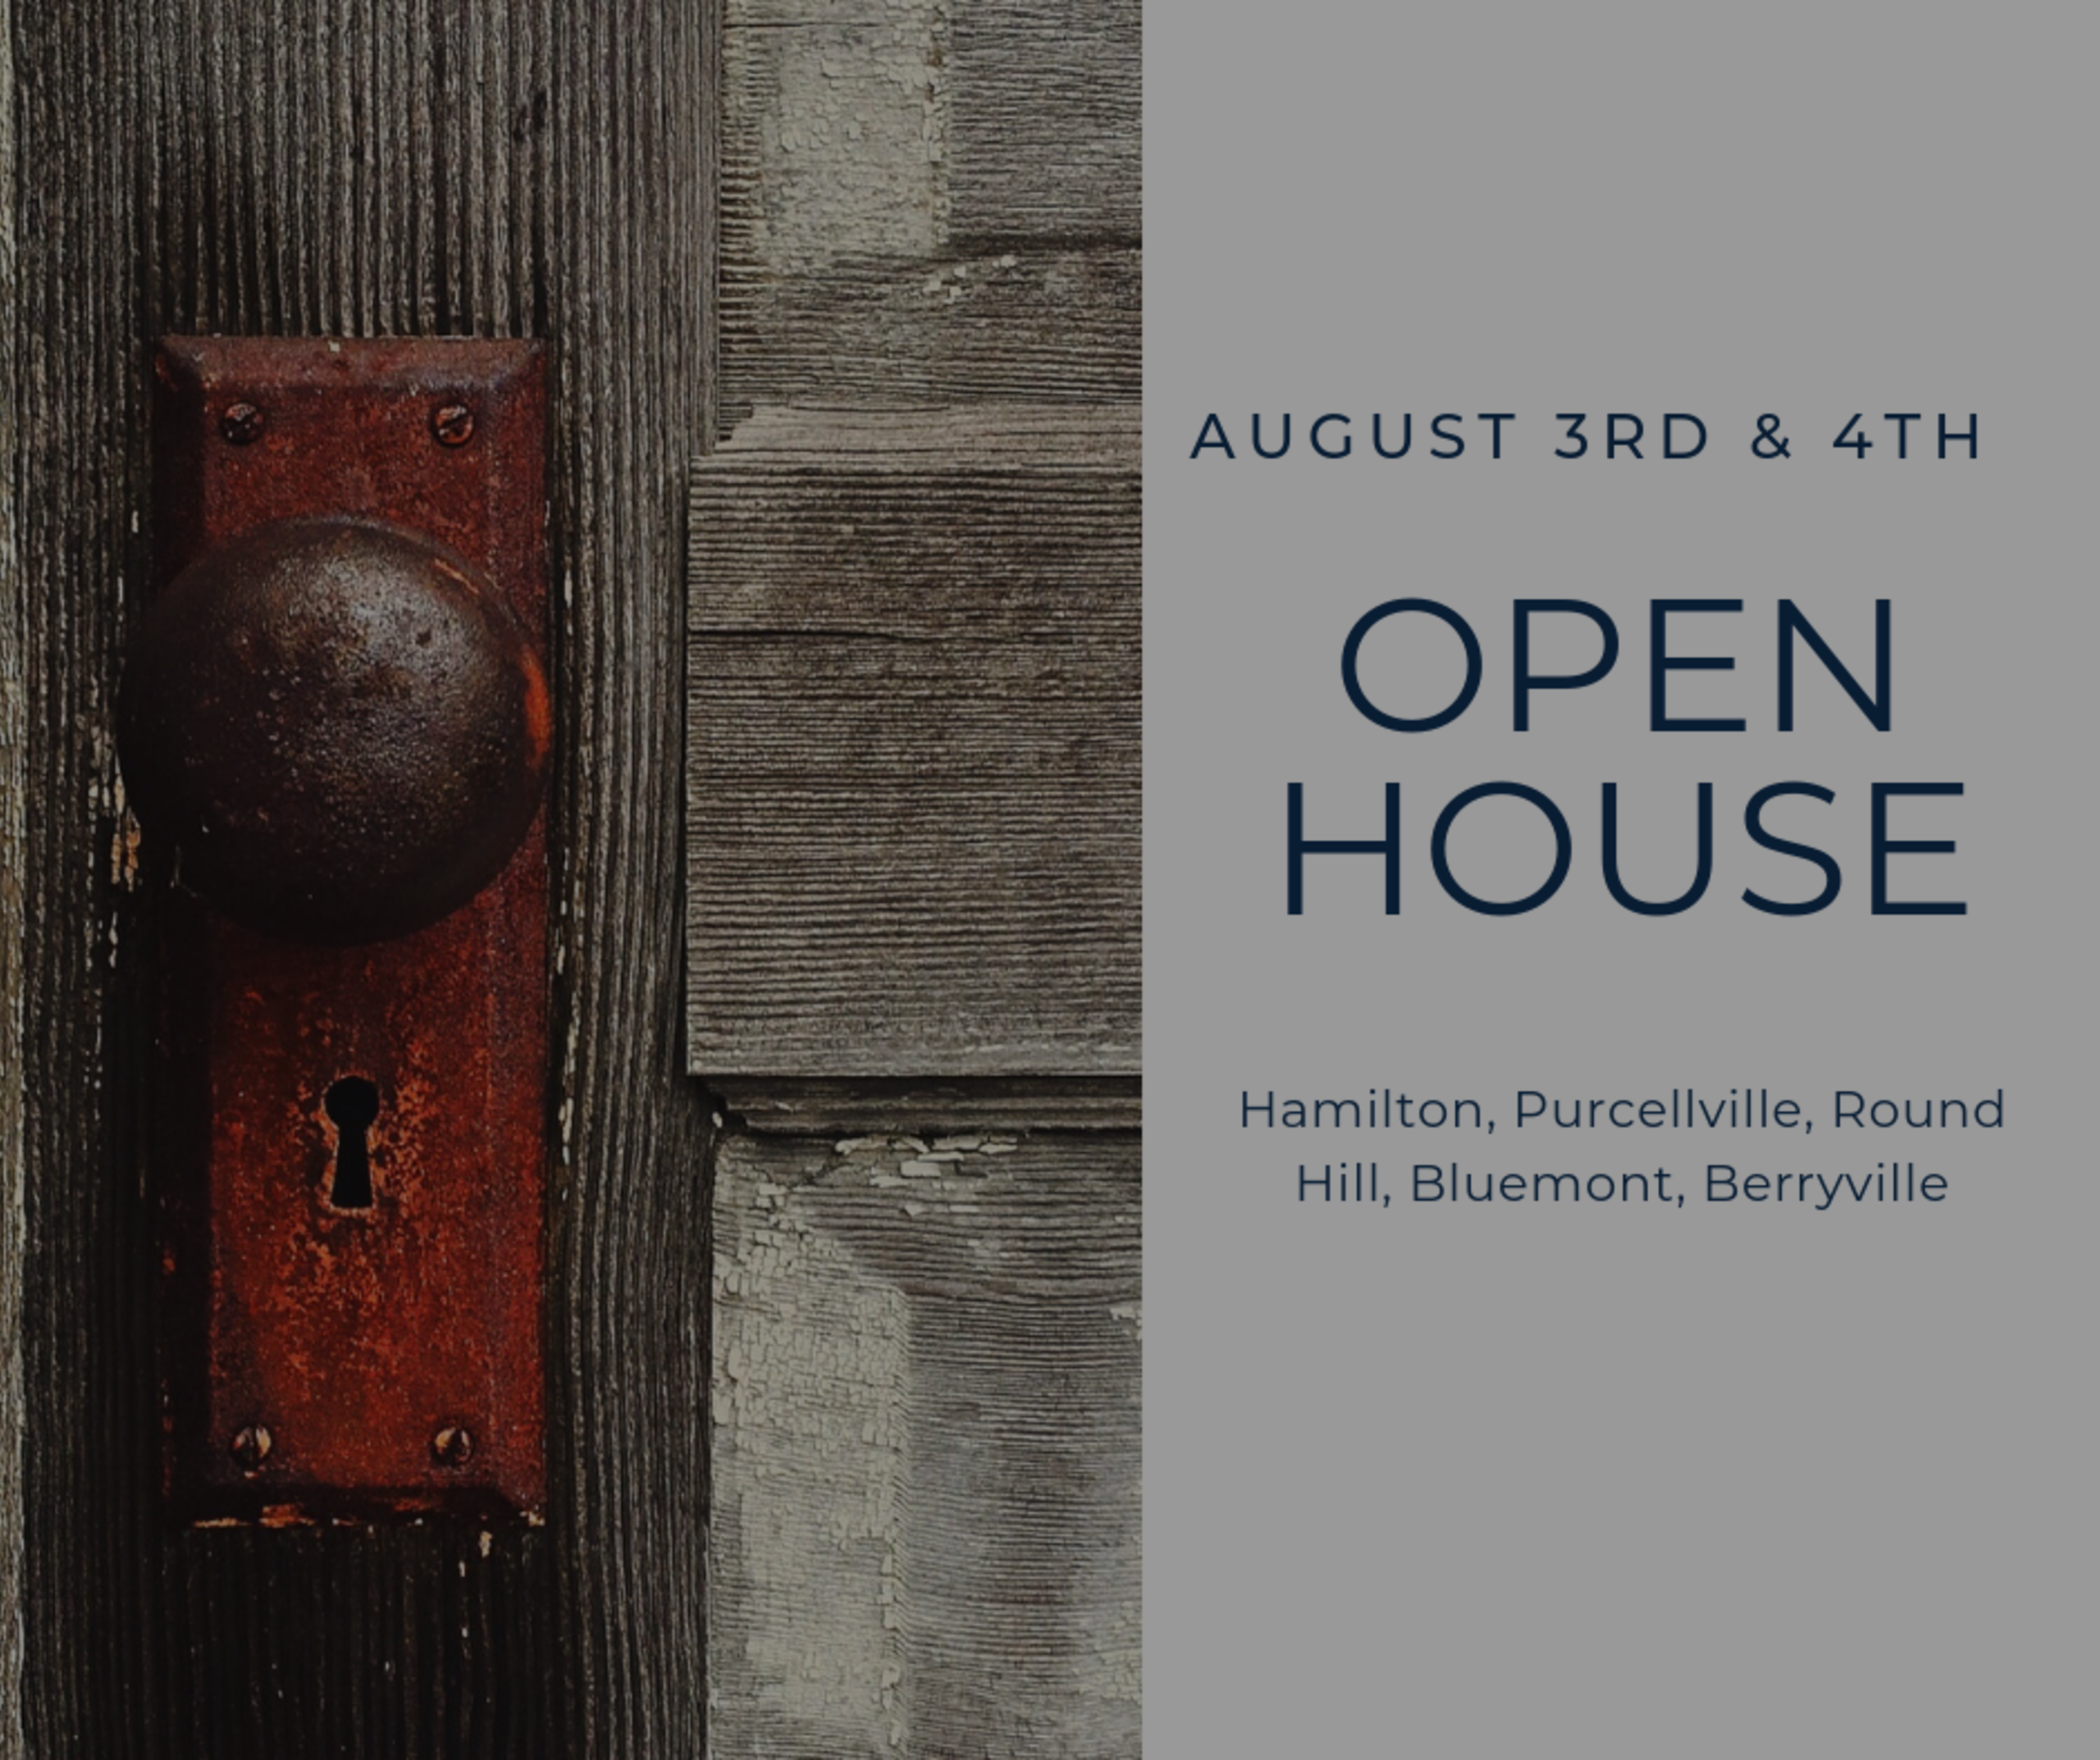 Open House List 8/3/19 – 8/4/19